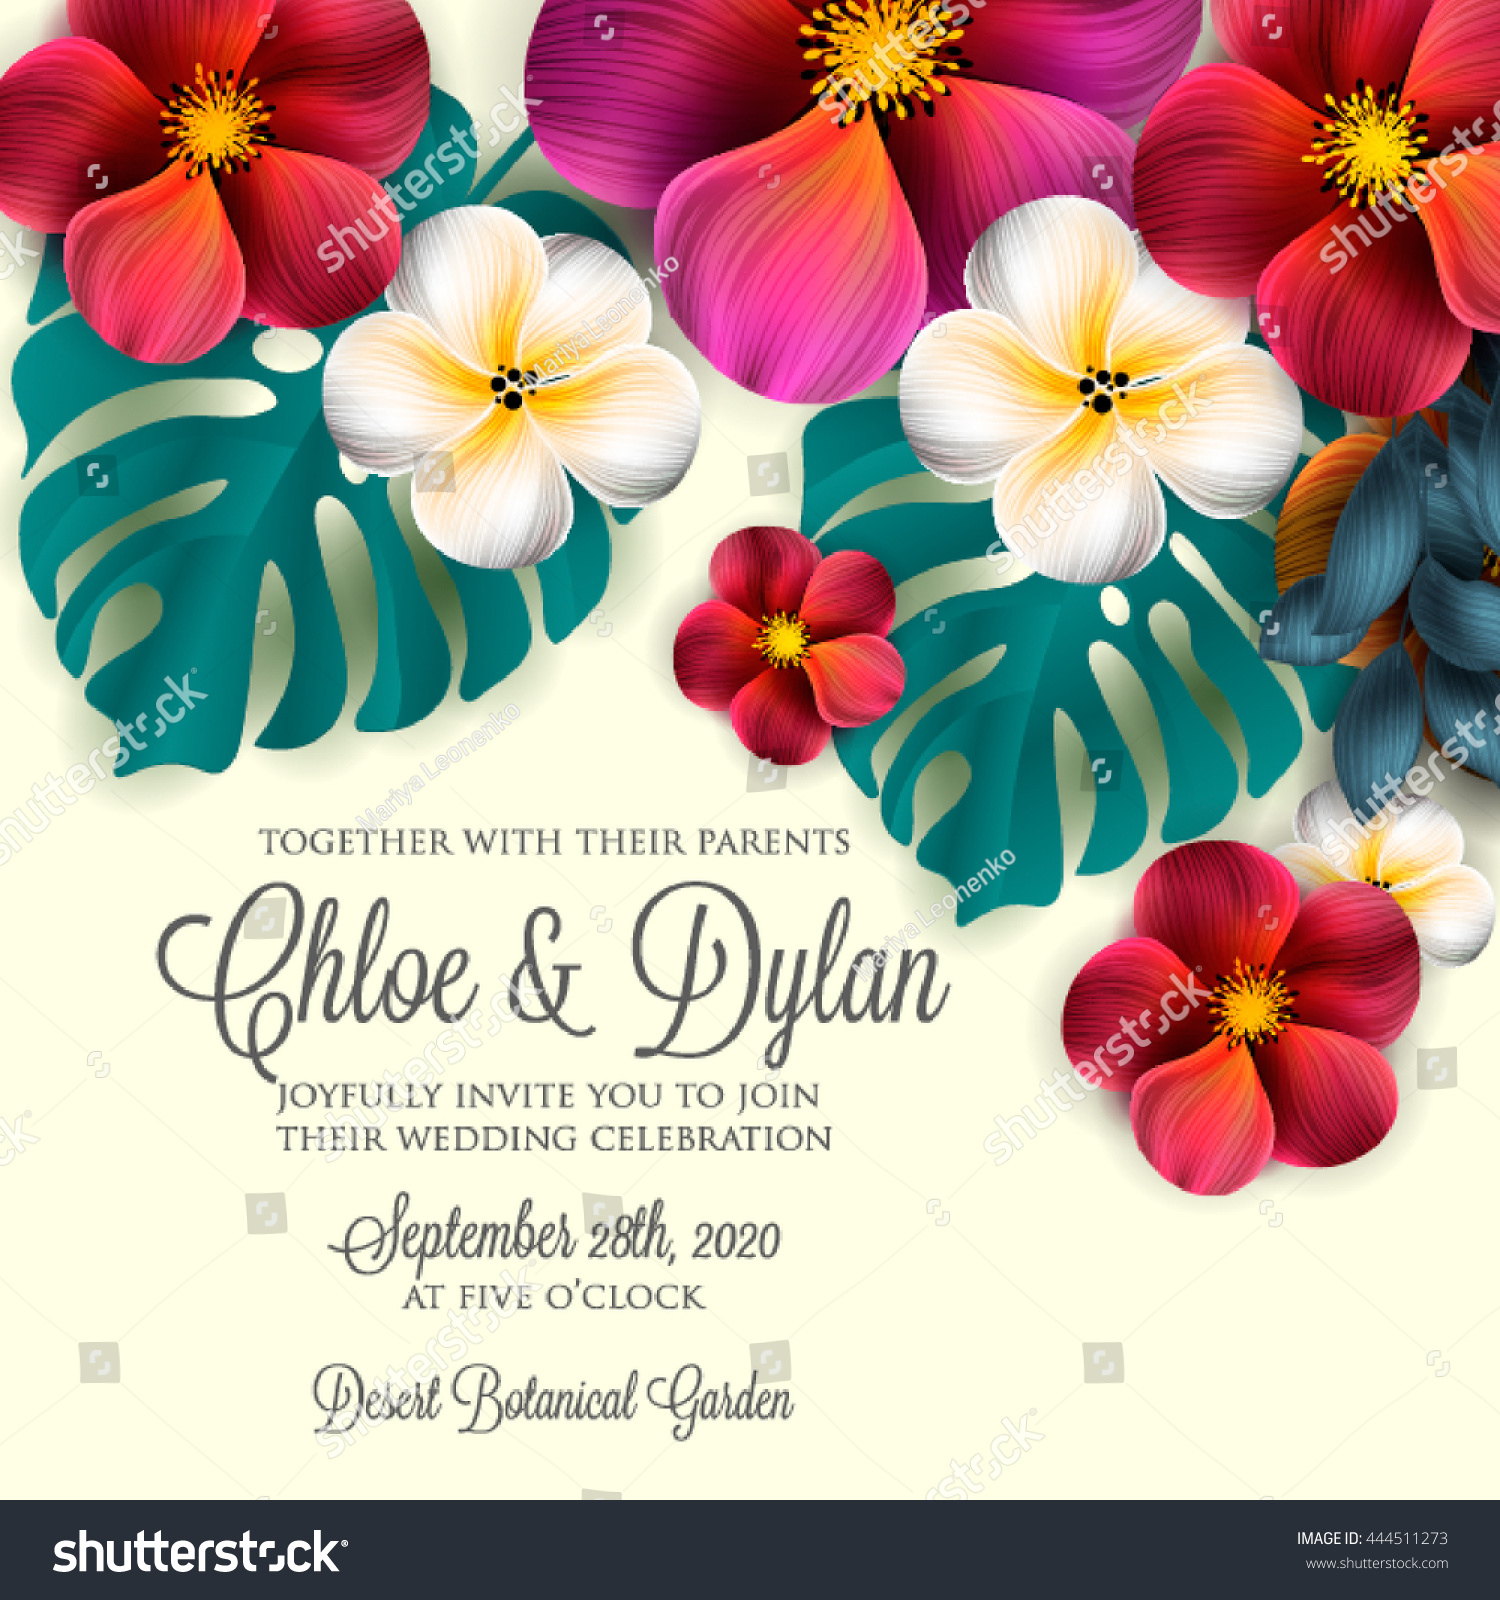 Wedding Invitation Hibiscus Lillyand Magnolia Flowers Stock Vector